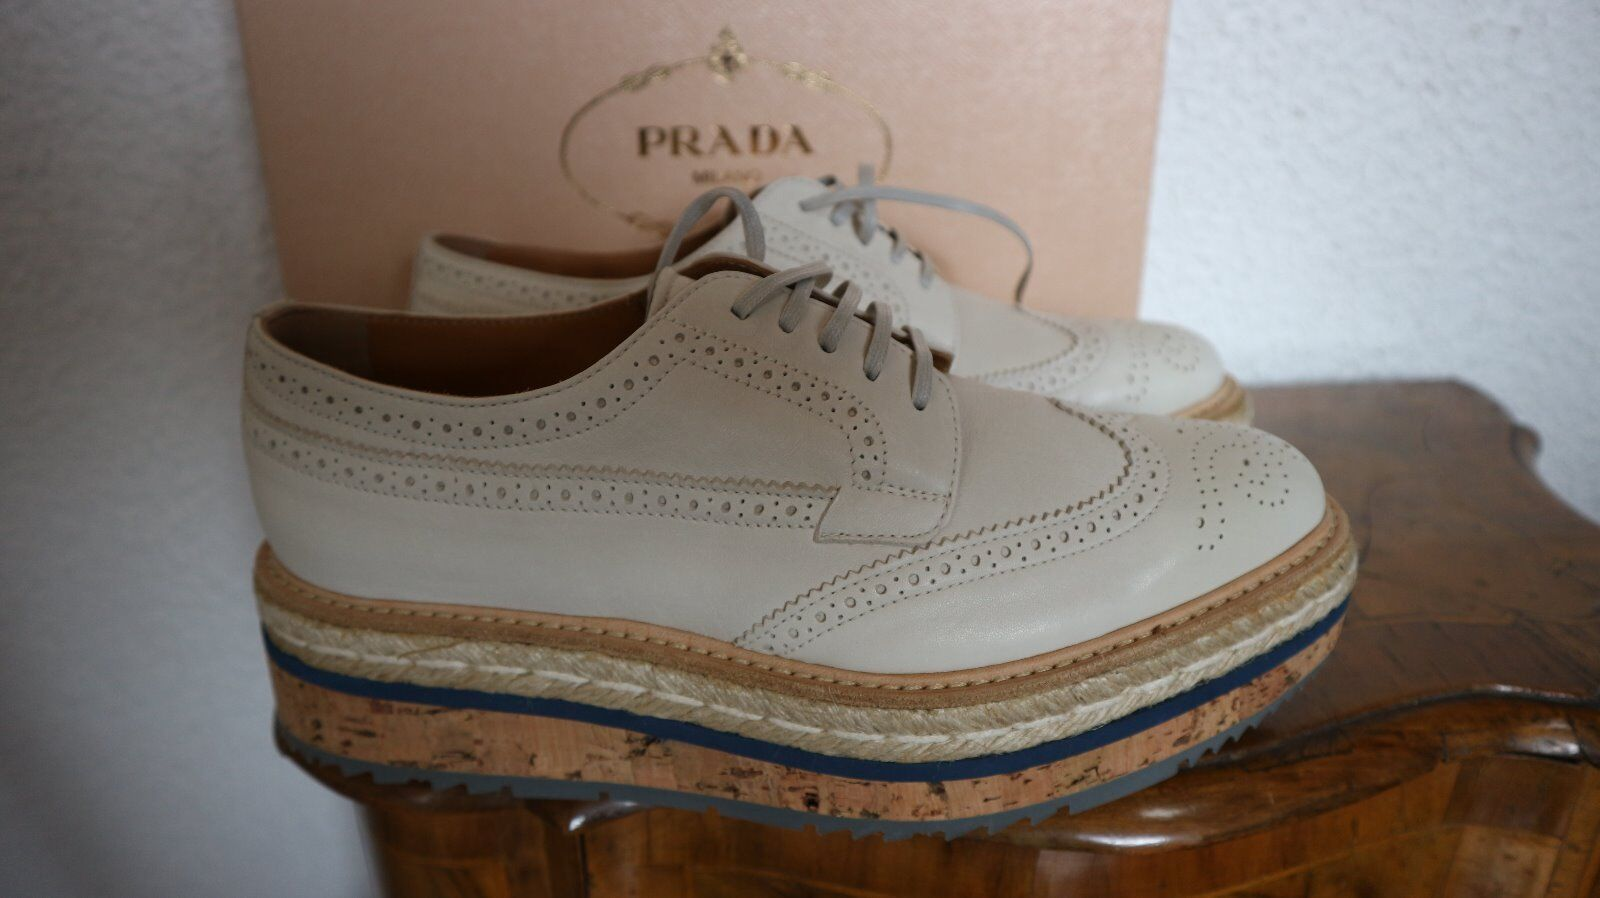 Original Schuhe PRADA Schuhe Original Halbschuhe Sneaker,Leder,Korken,Gr.39,Neu,Karton+SB 52ad2e